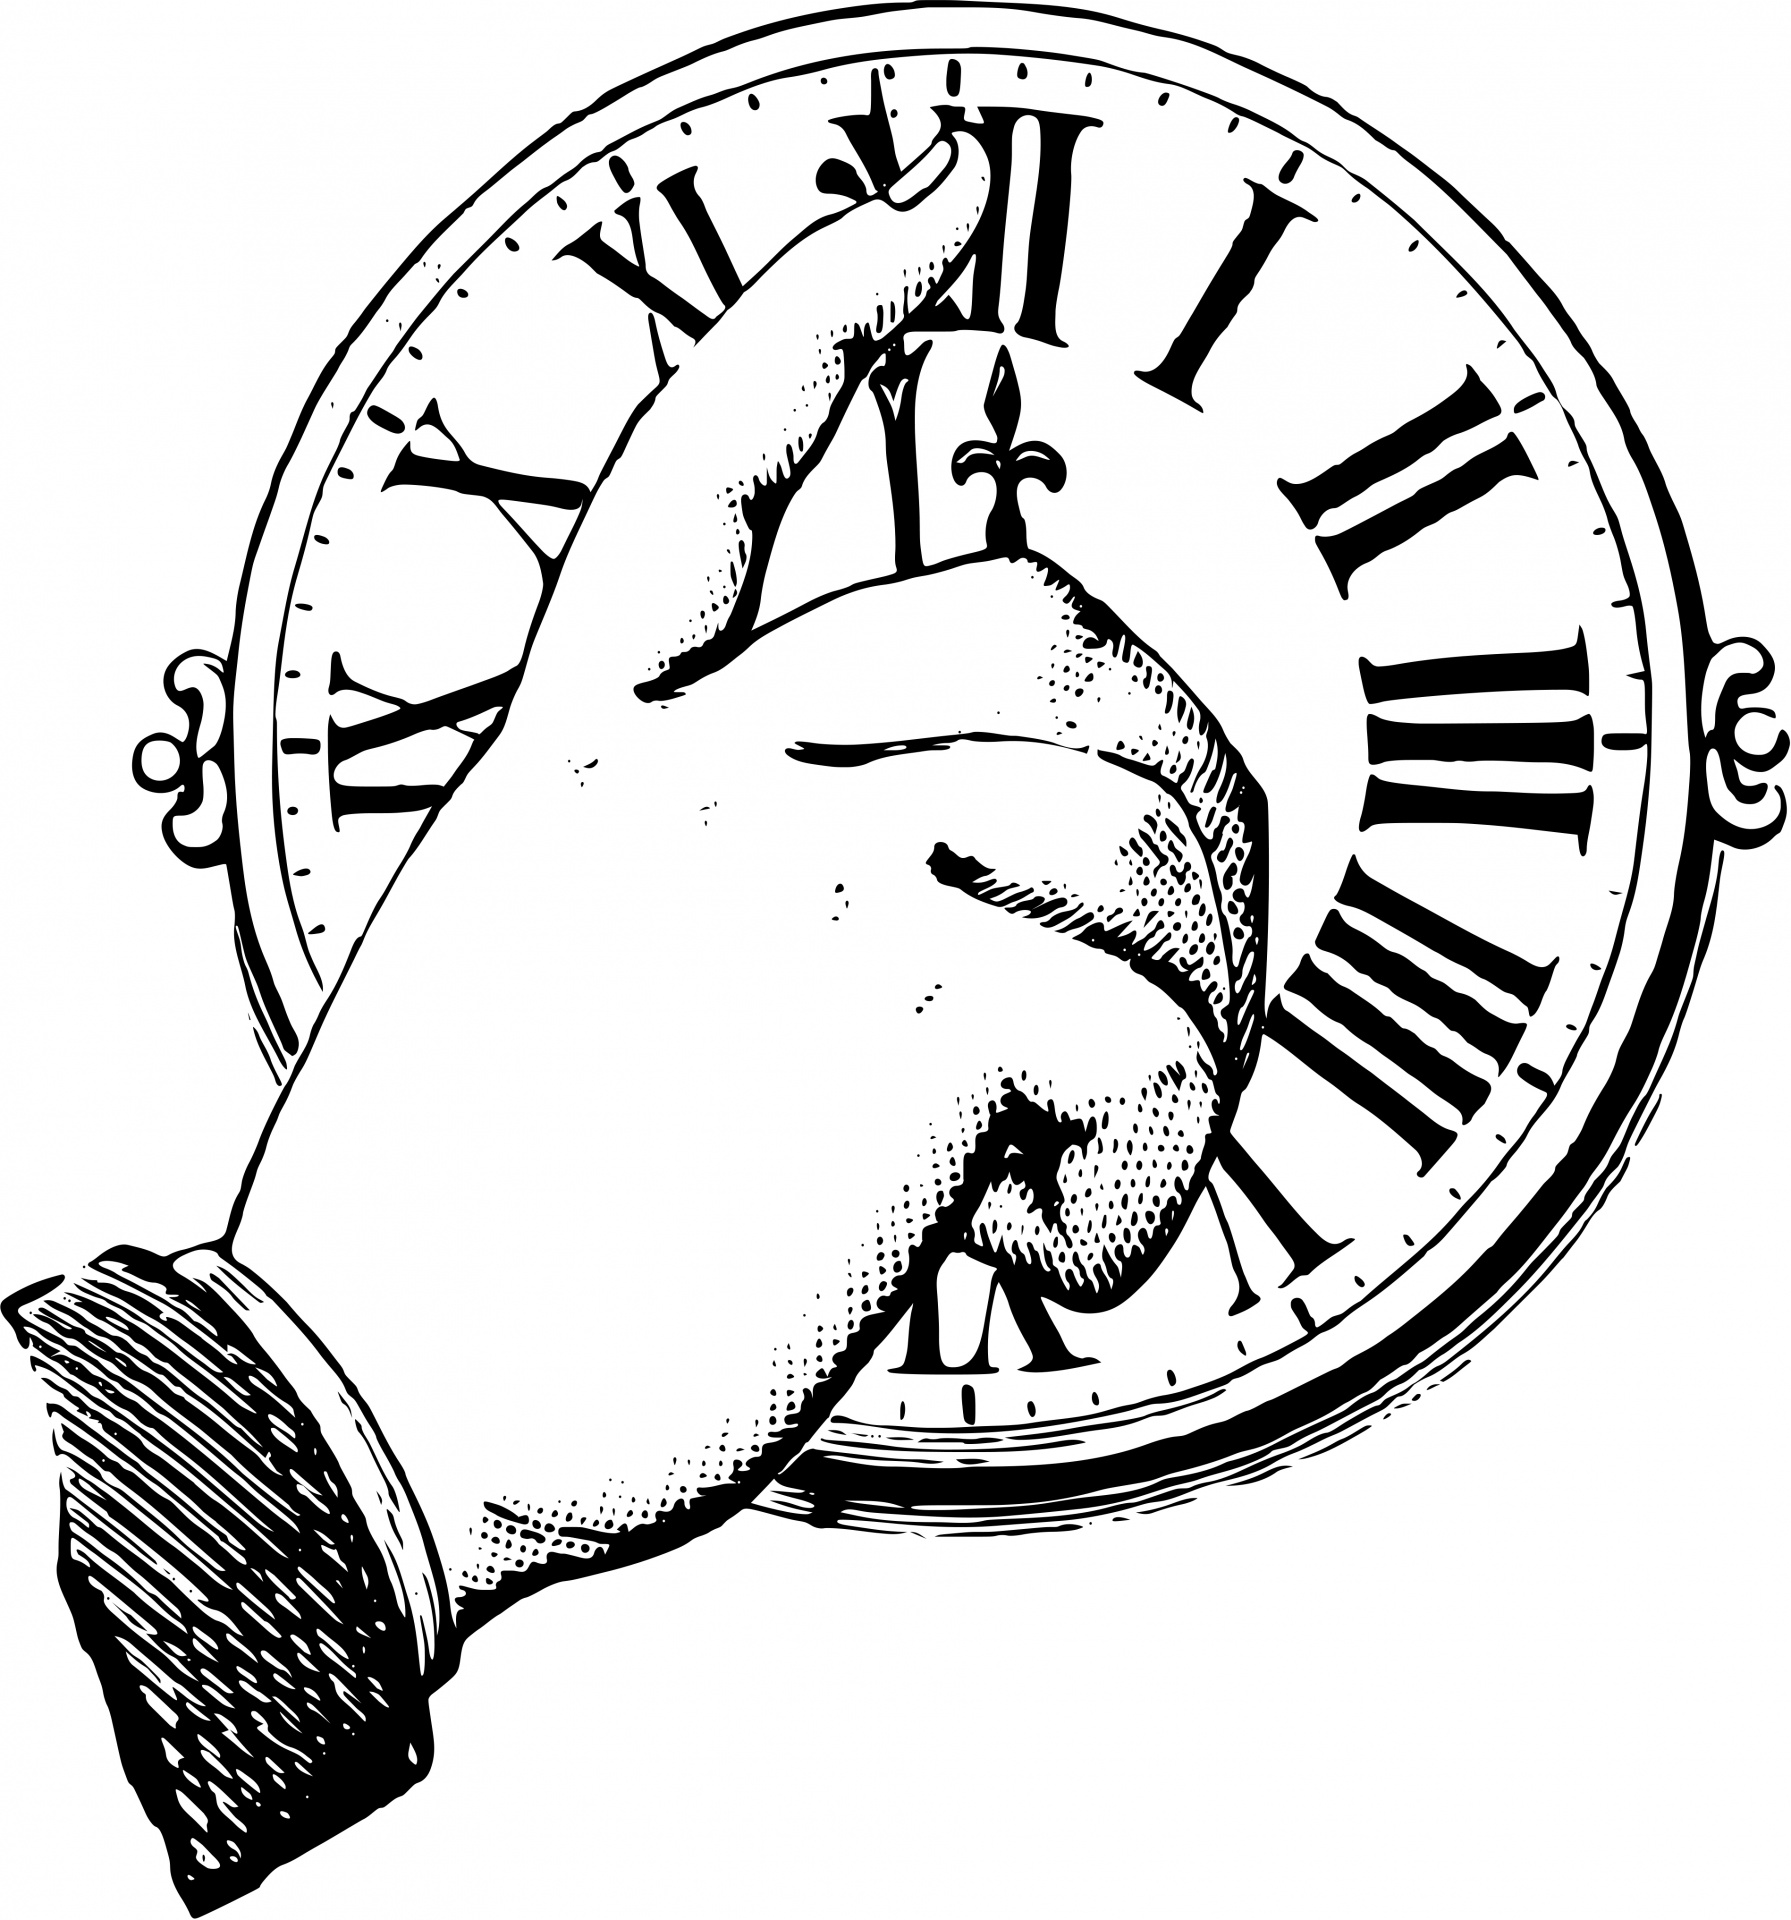 Clock Hand Free Stock Photo